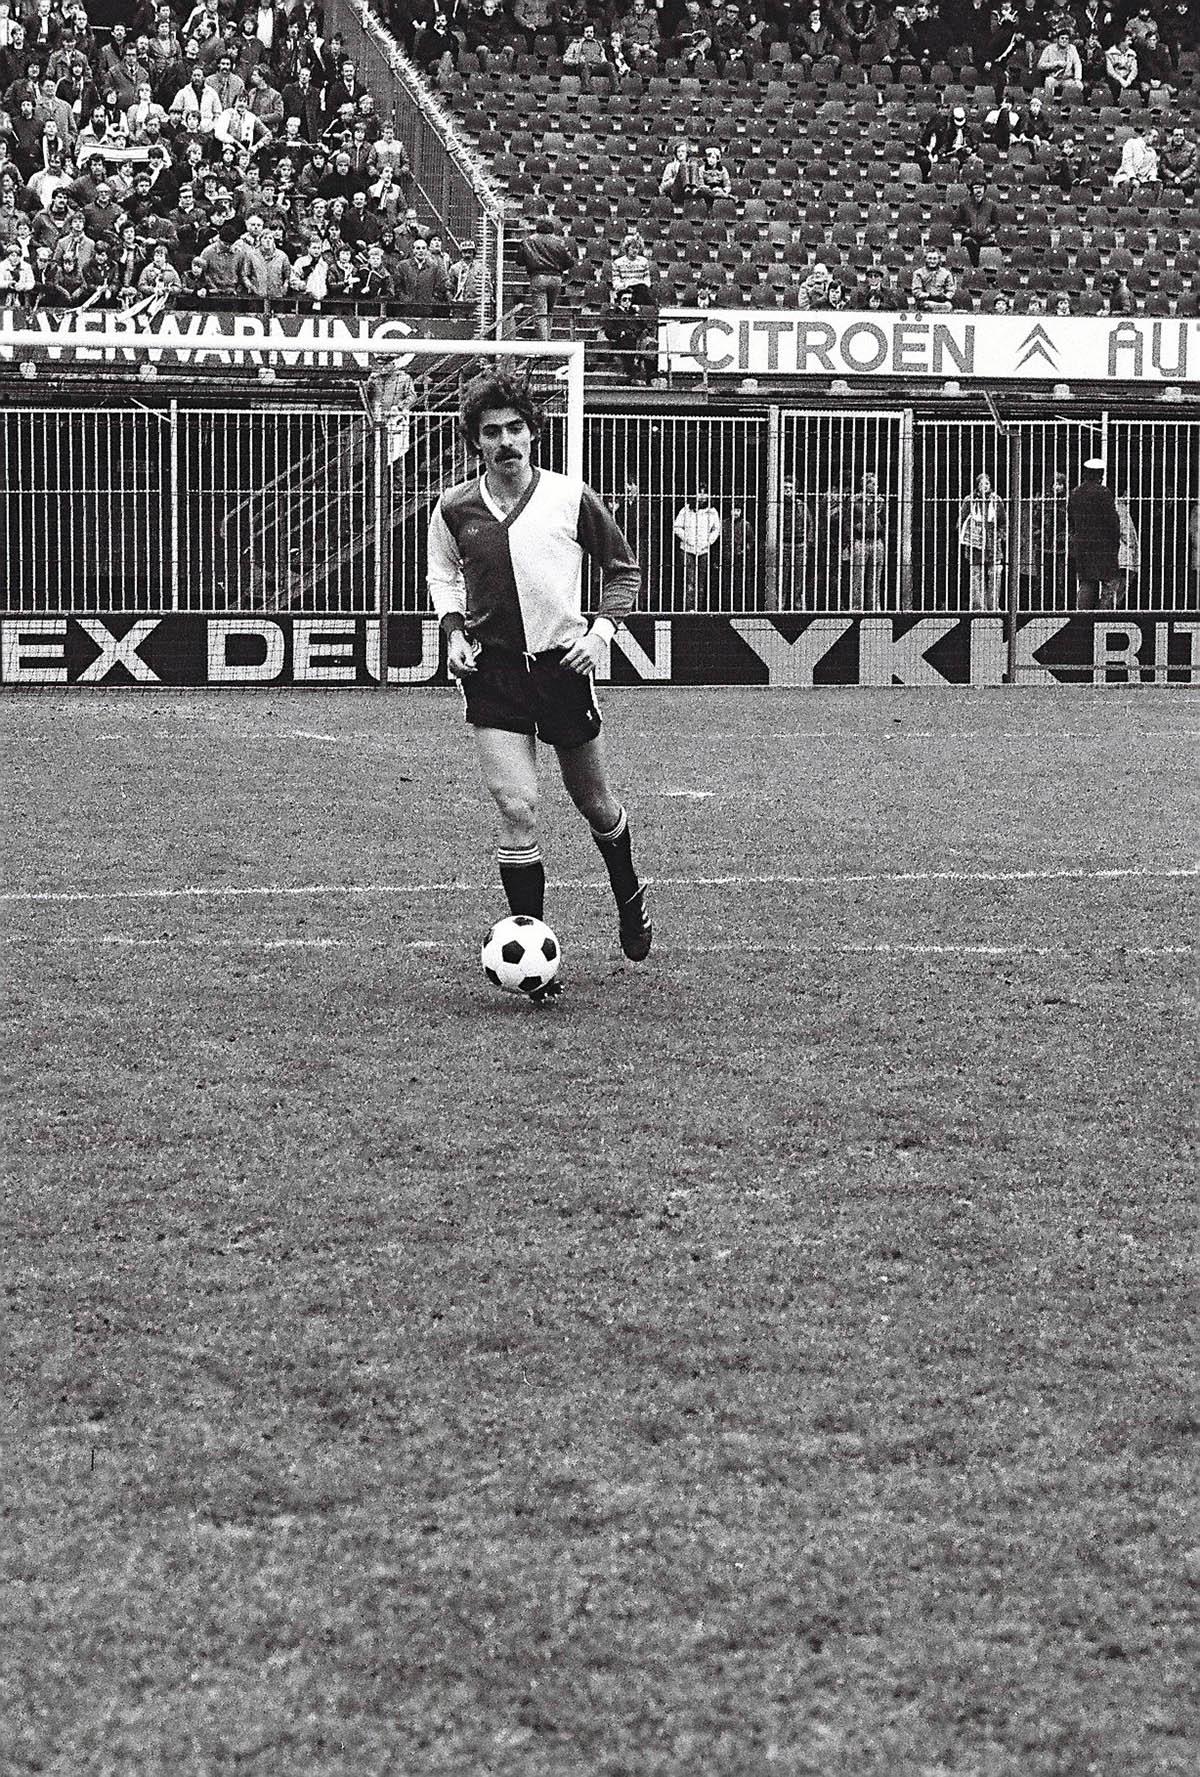 Andre Stafleu in actie tijdens Feyenoord - Sparta, 1 februari 1981 - (2-2)